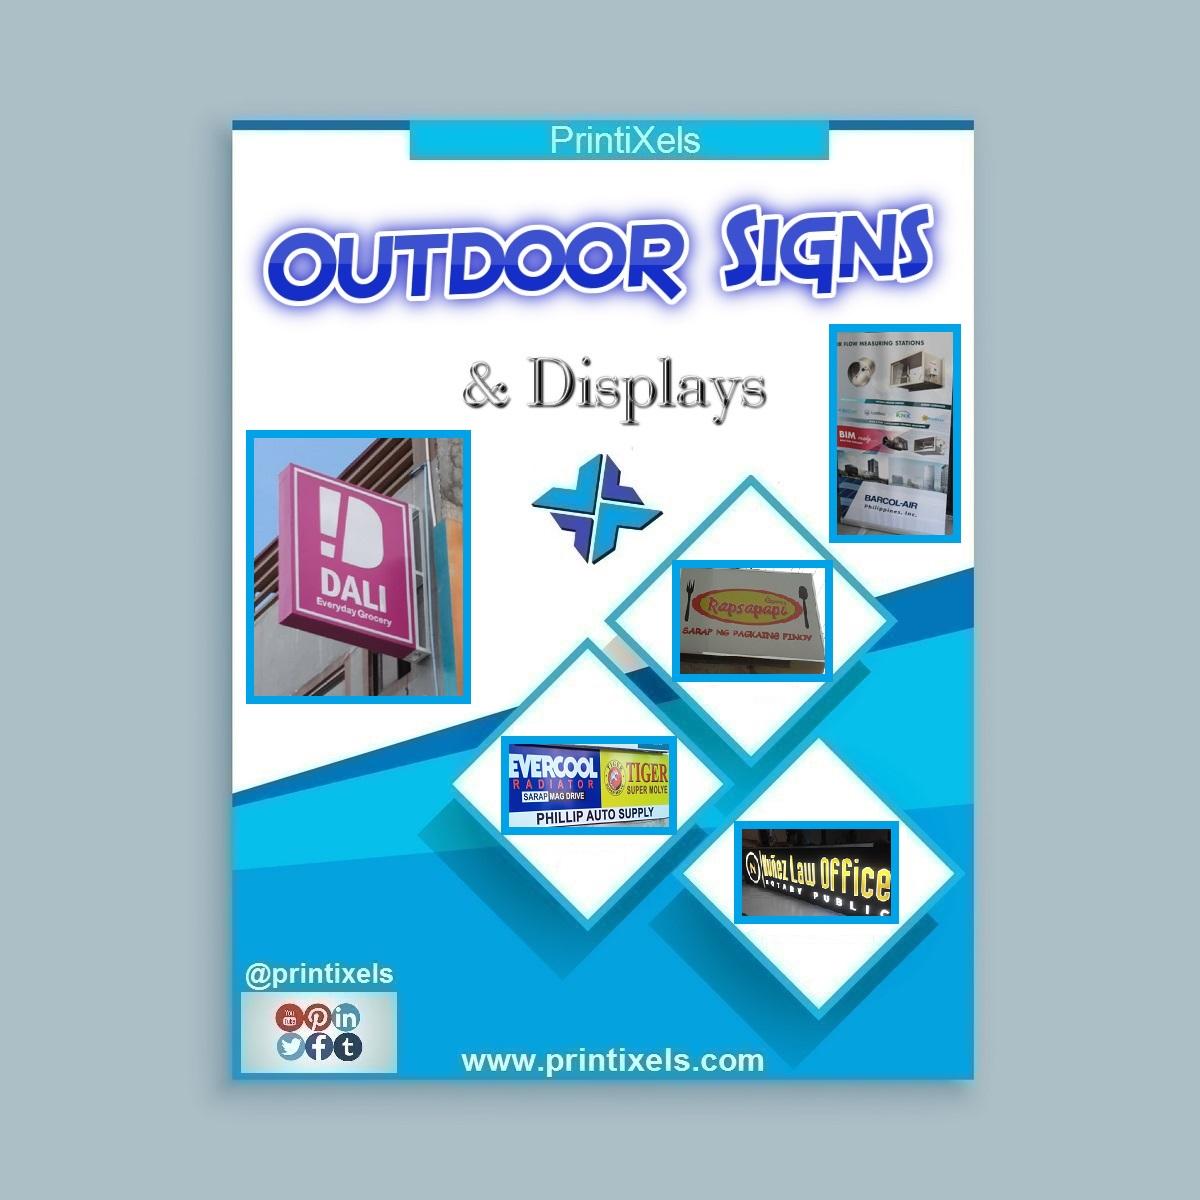 Custom Outdoor Signs & Displays Philippines